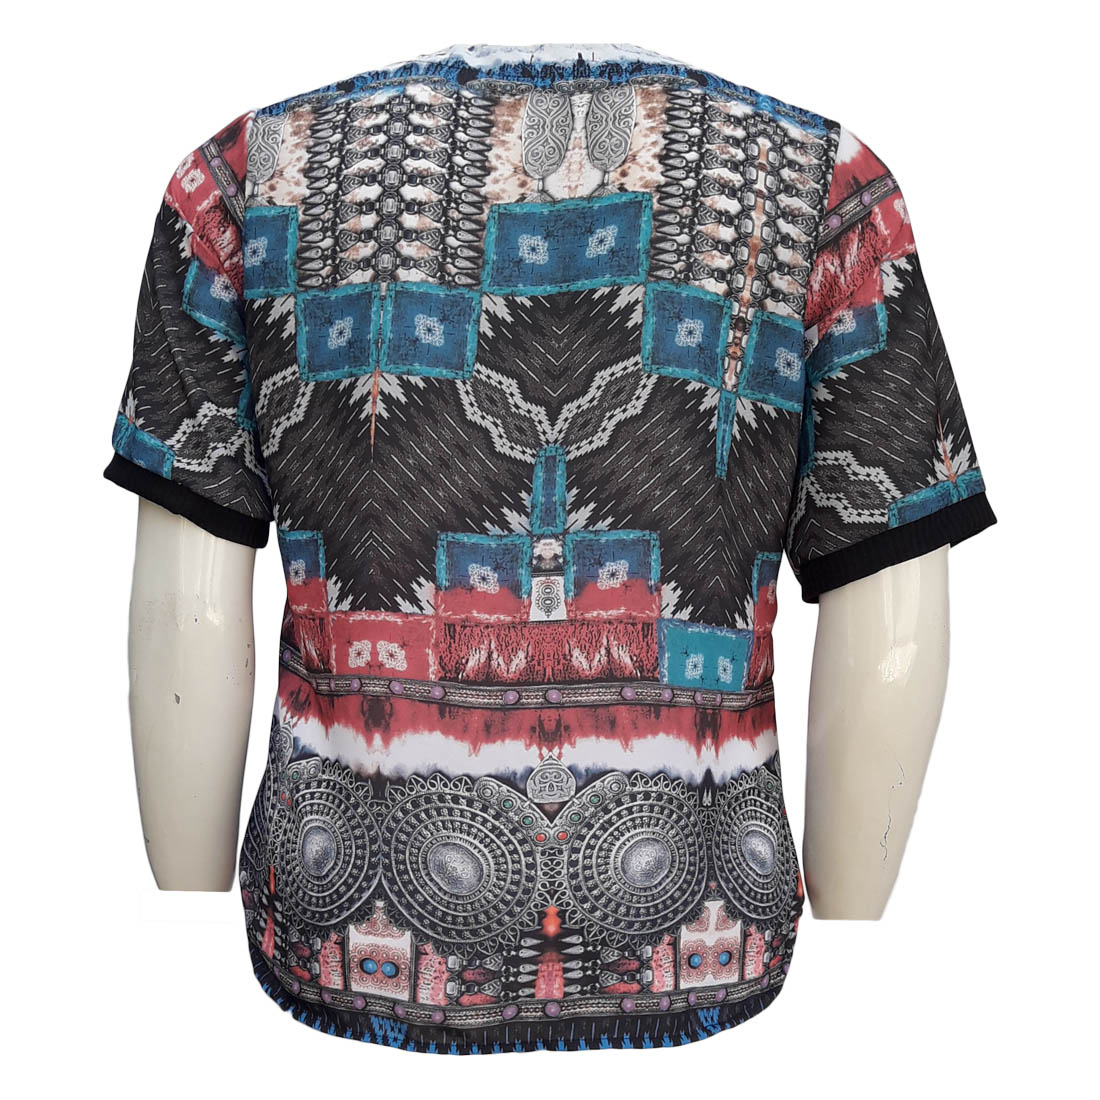 Blusa Feminina Estampada Plus Size Moda Evangélica